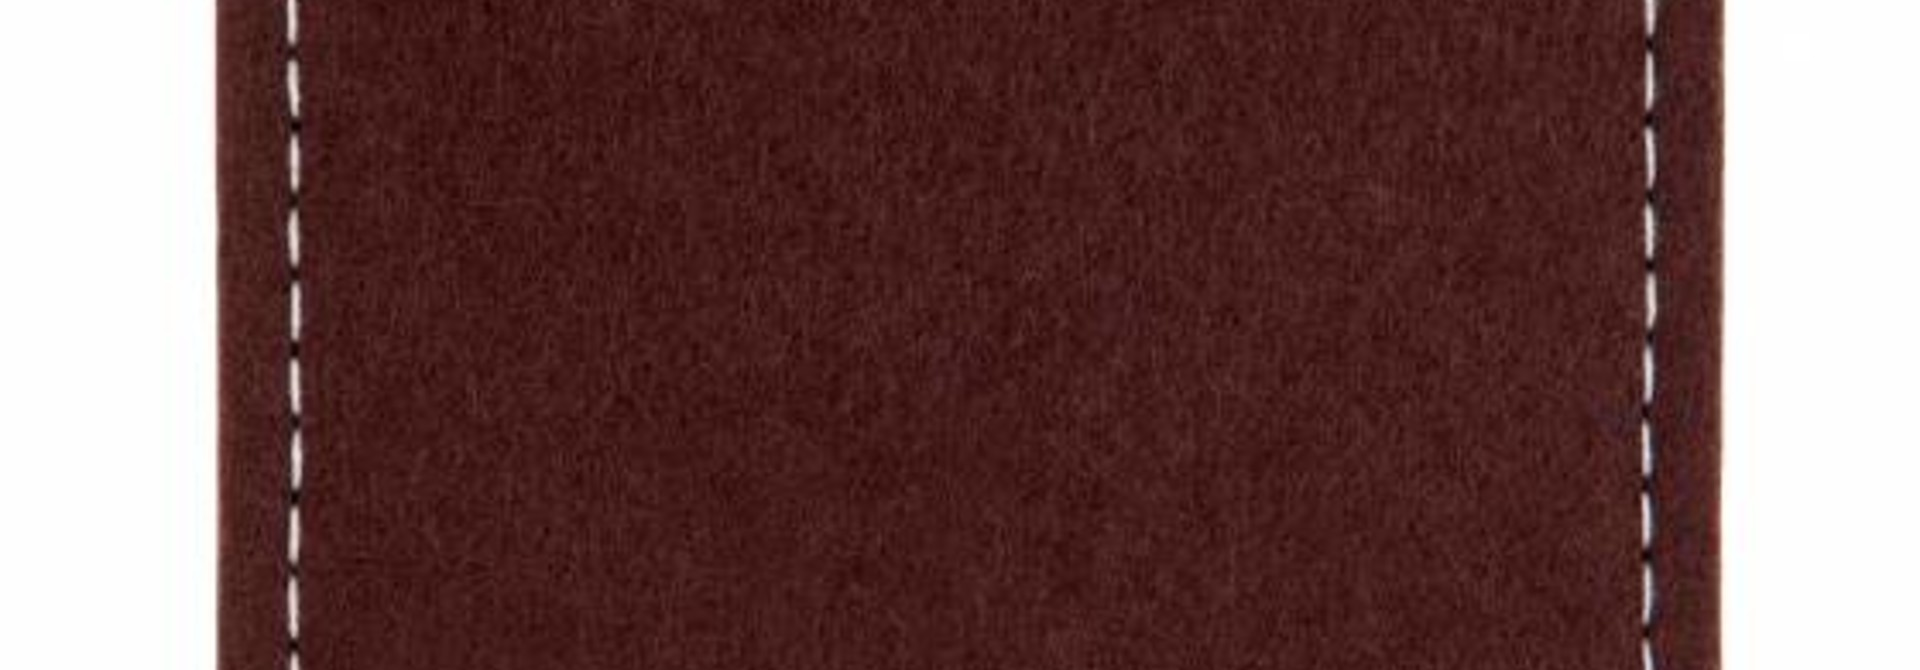 Pixel Sleeve Dunkelbraun